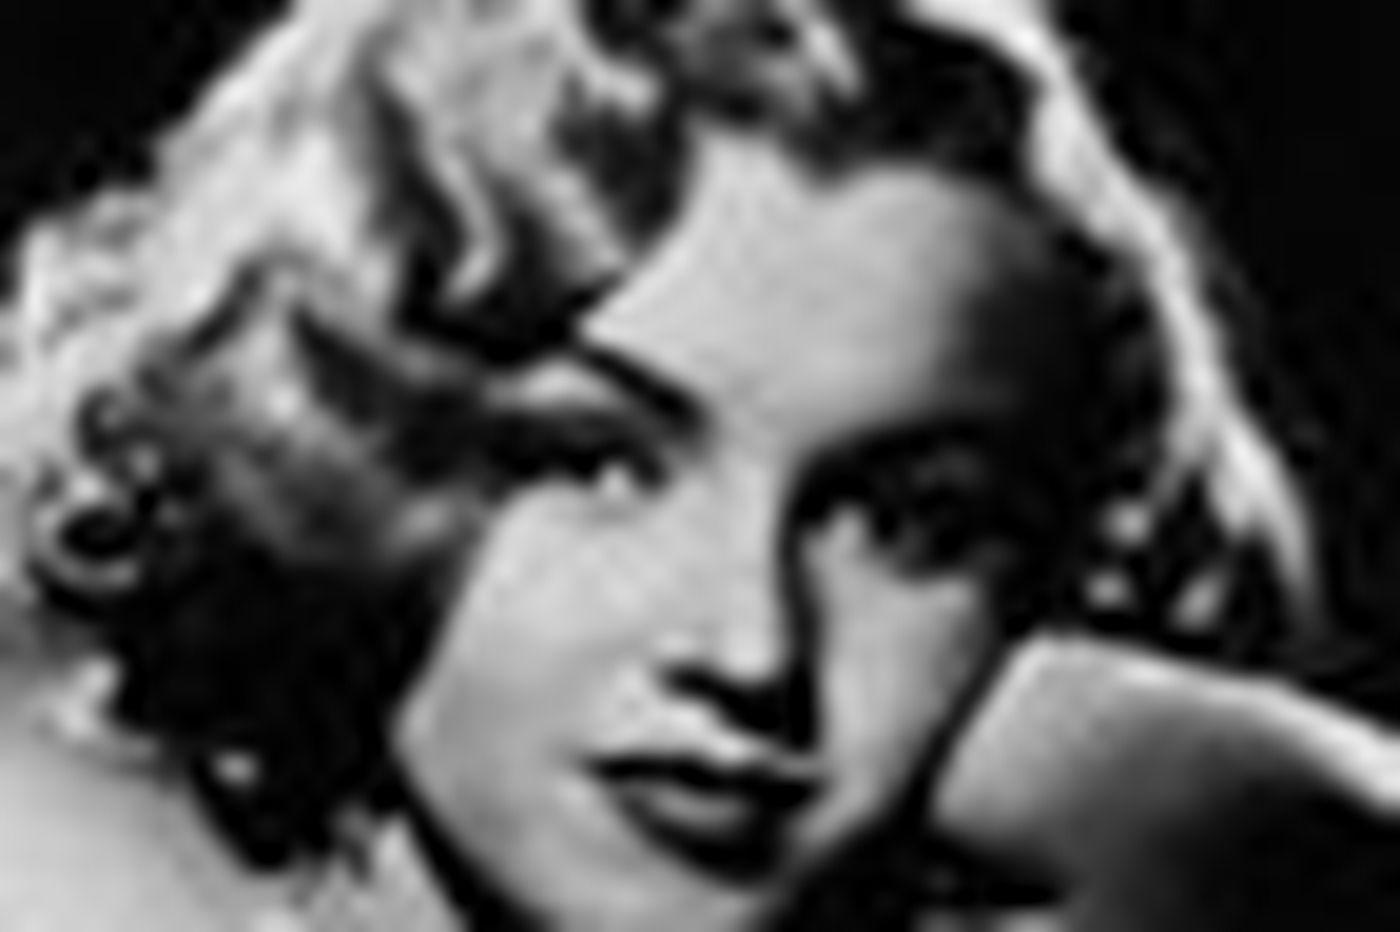 FBI opens up files on Marilyn Monroe